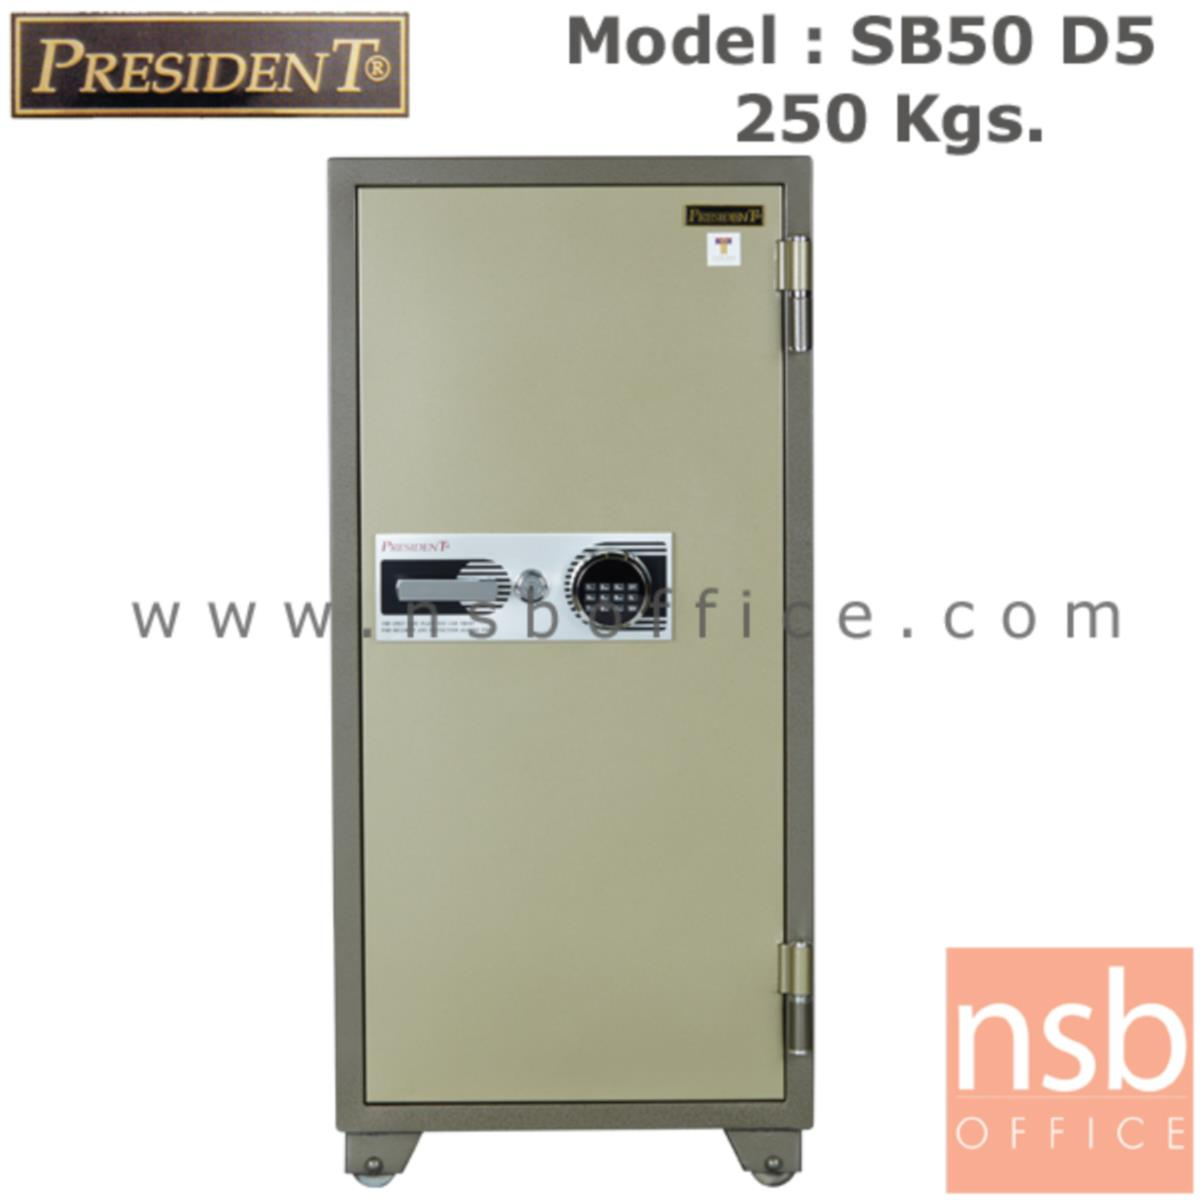 F05A063:ตู้เซฟนิรภัยชนิดดิจิตอลแบบใหม่ 250 กก.  รุ่น PRESIDENT-SB50D5 มี 1 กุญแจ 1 รหัส (รหัสใช้กดหน้าตู้)